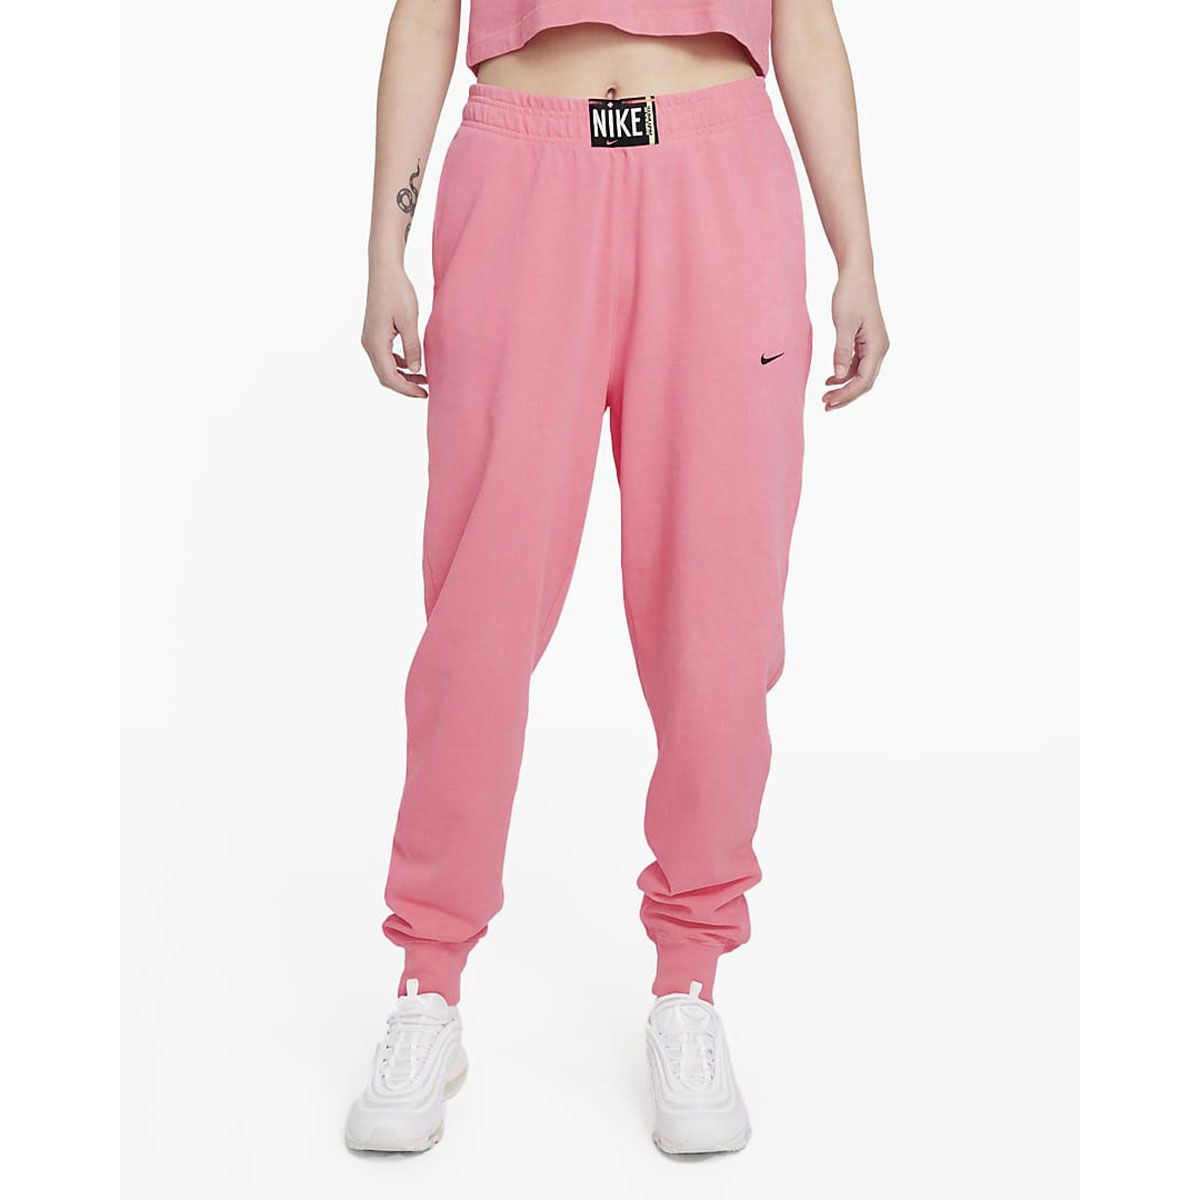 Nike Pantaloni Sportswear Donna Rosa